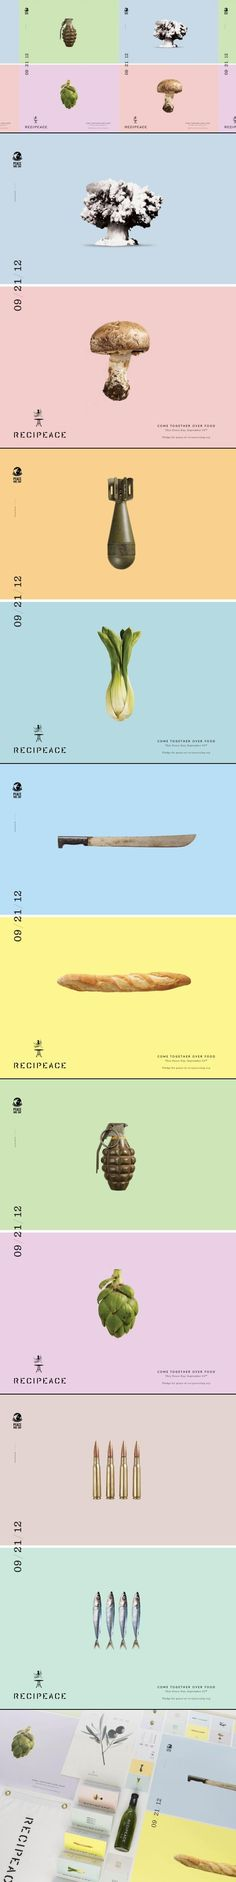 Recipeace Campaign by Leo Burnett